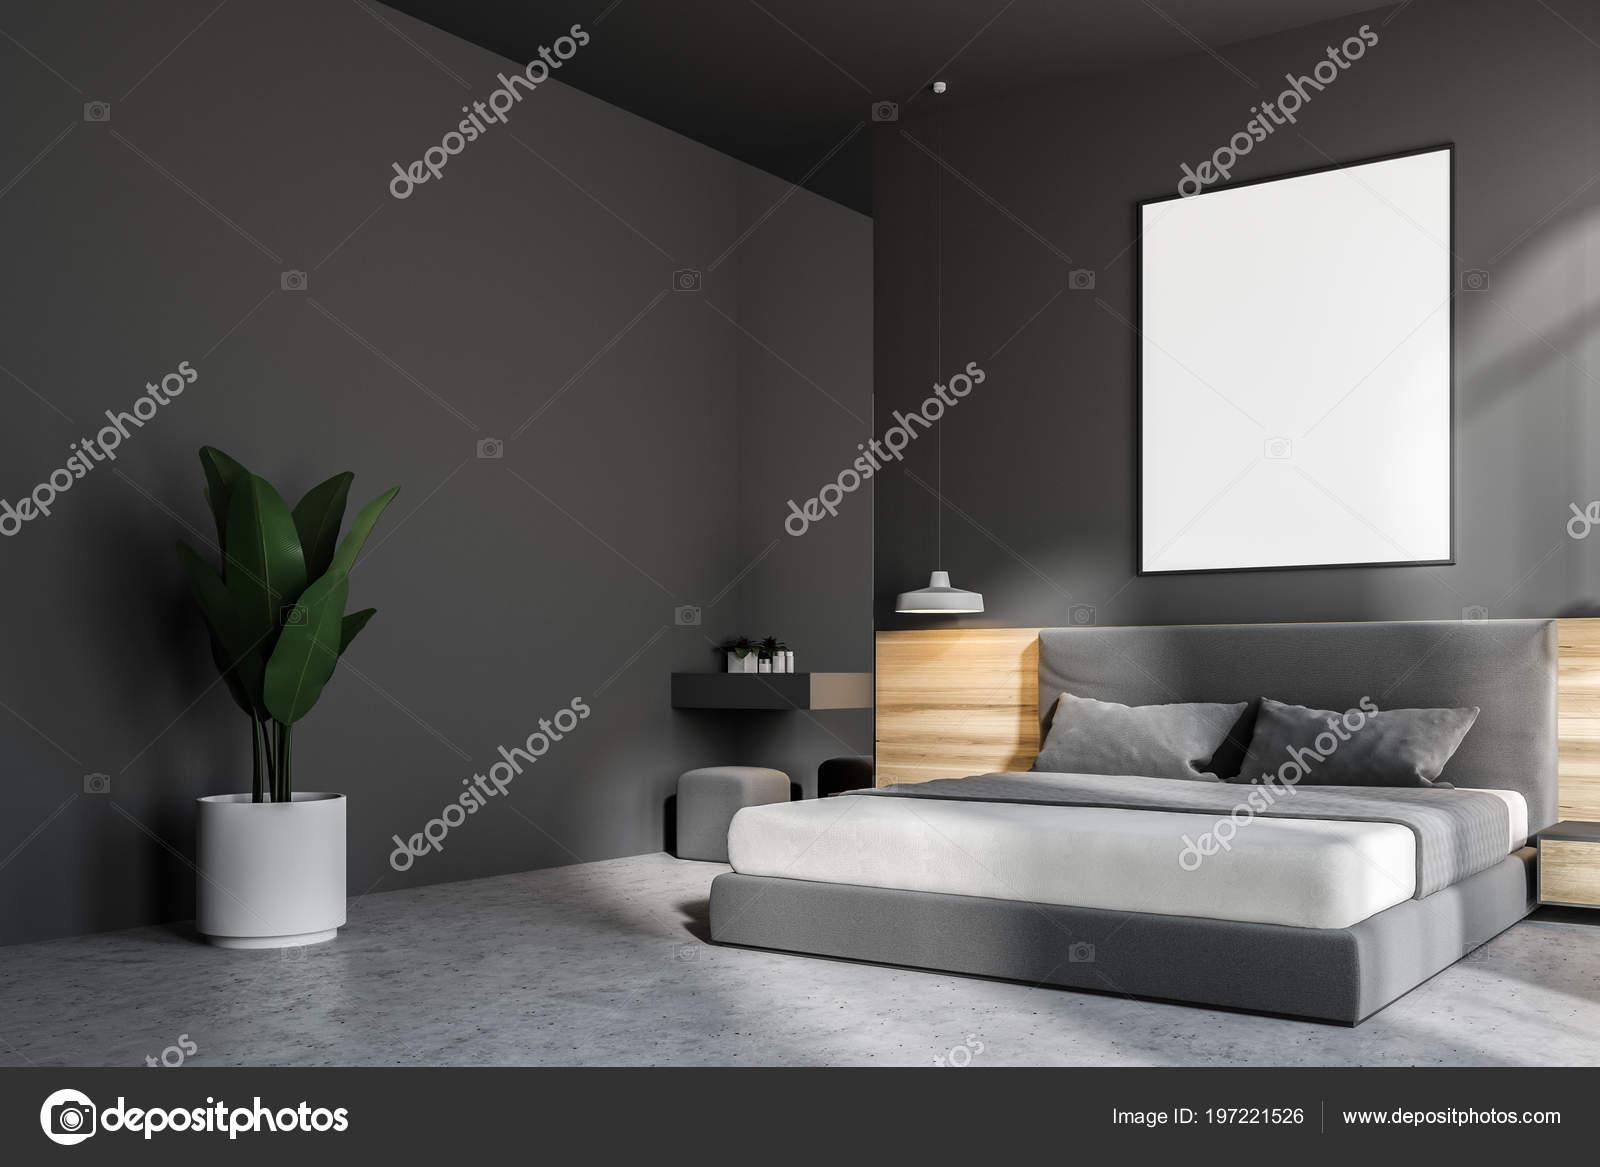 Dark Gray Bedroom Interior Concrete Floor King Size Bed Frame ...